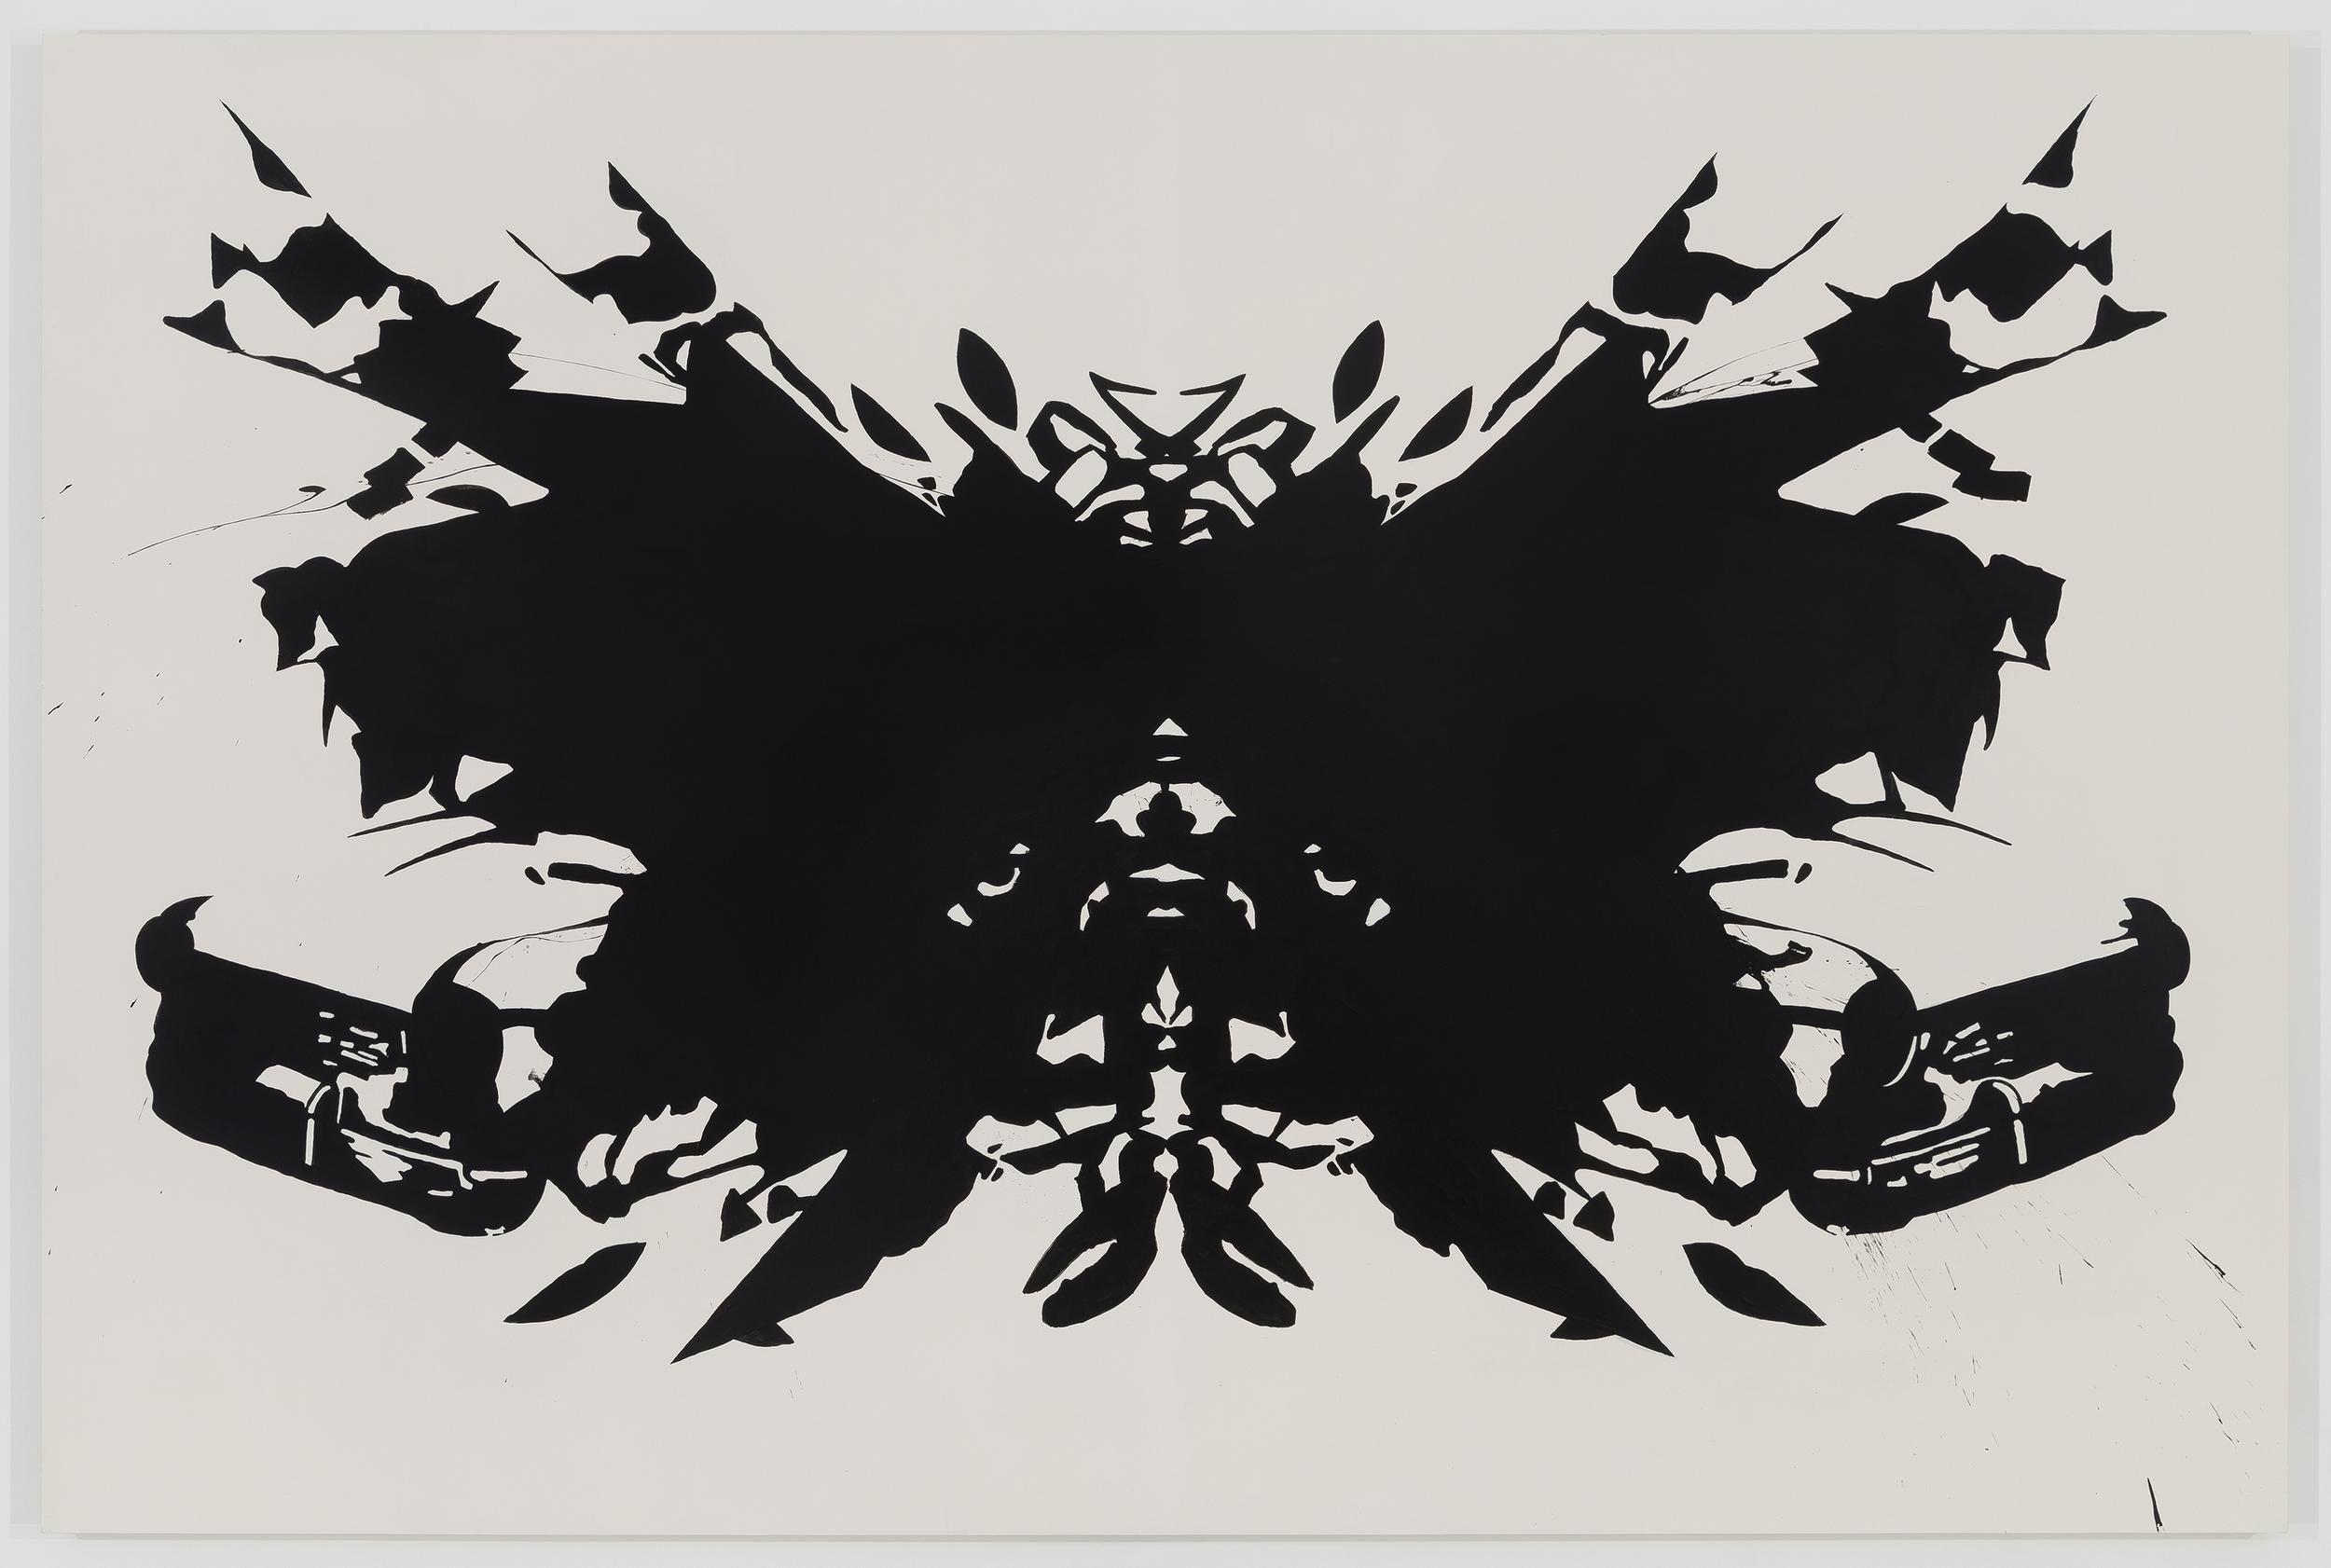 SELF PORTRAIT (INKBLOT)  2014 ACRYLIC ON PANEL 60 X 90 INCHES